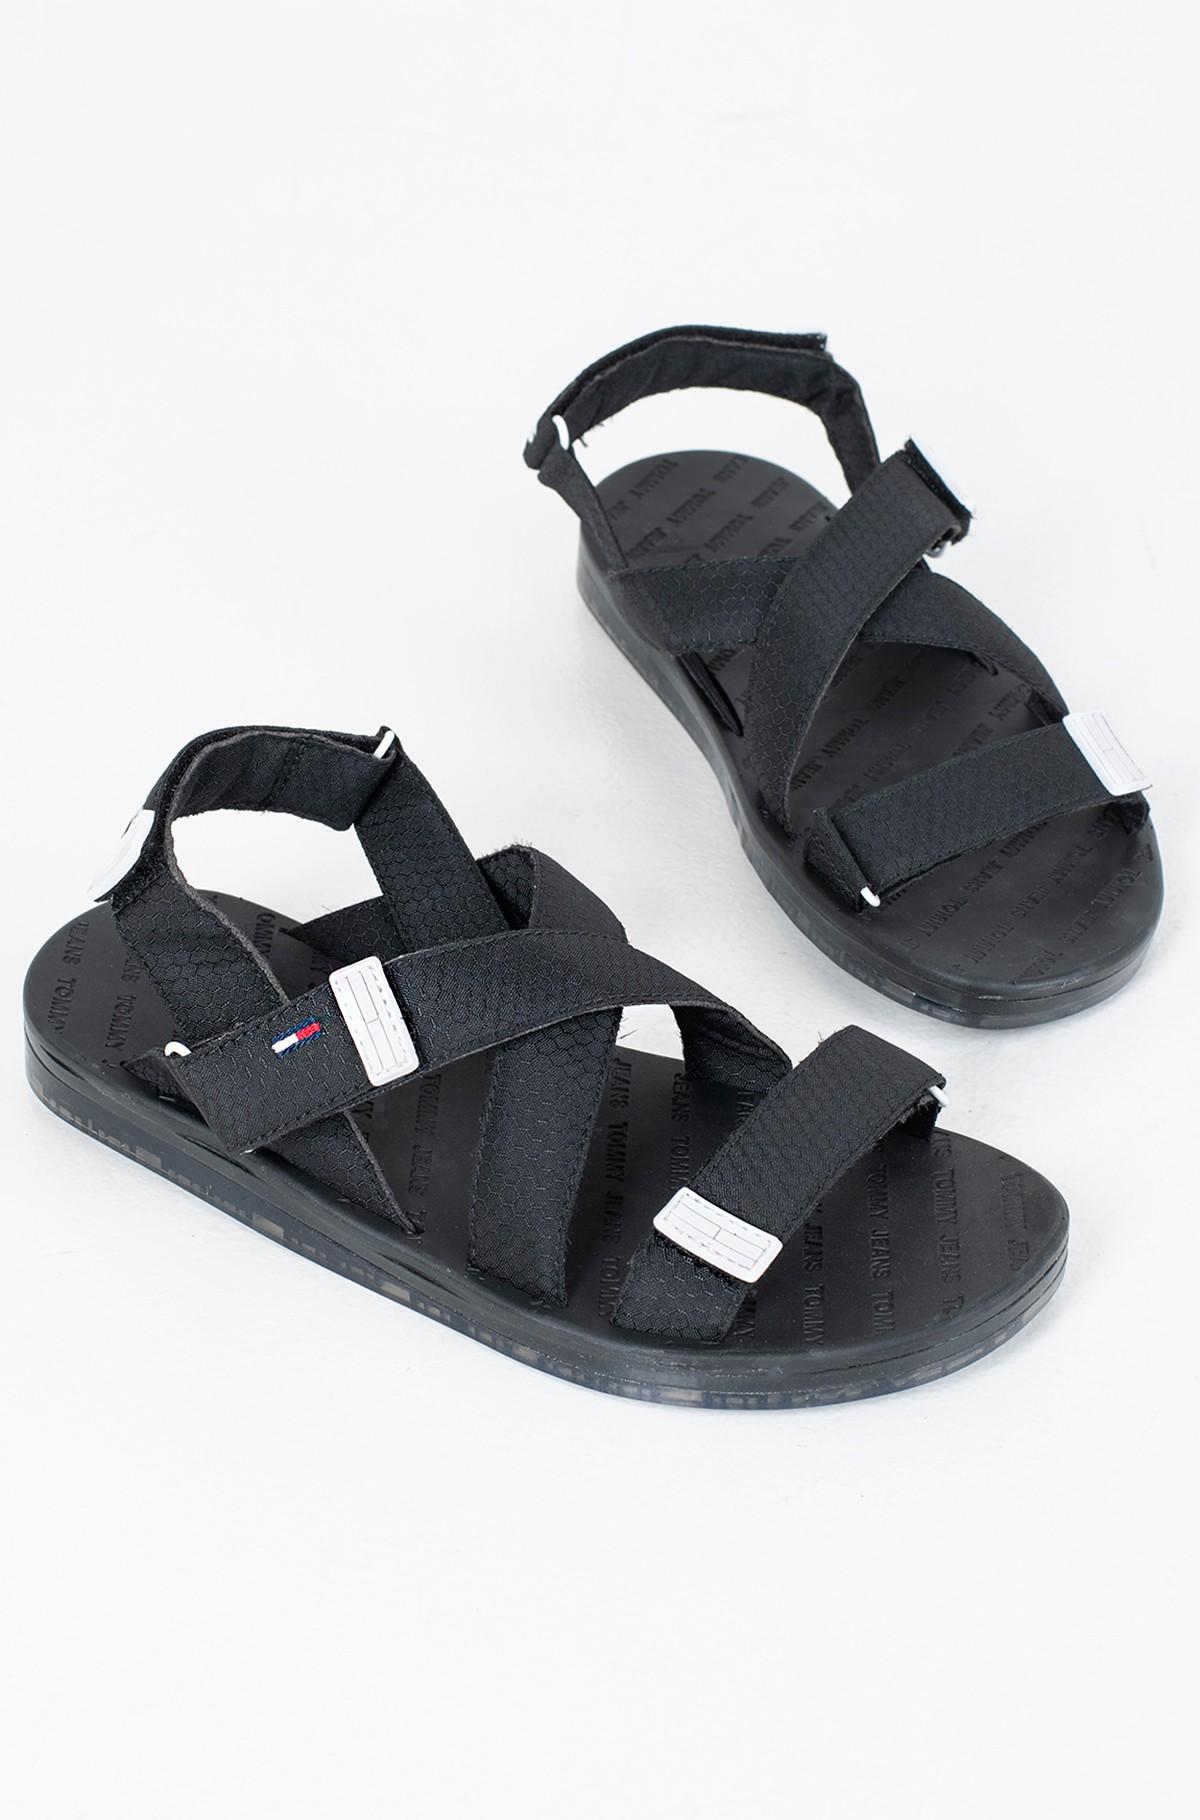 Sandales TOMMY SURPLUS FLAT SANDAL-full-2